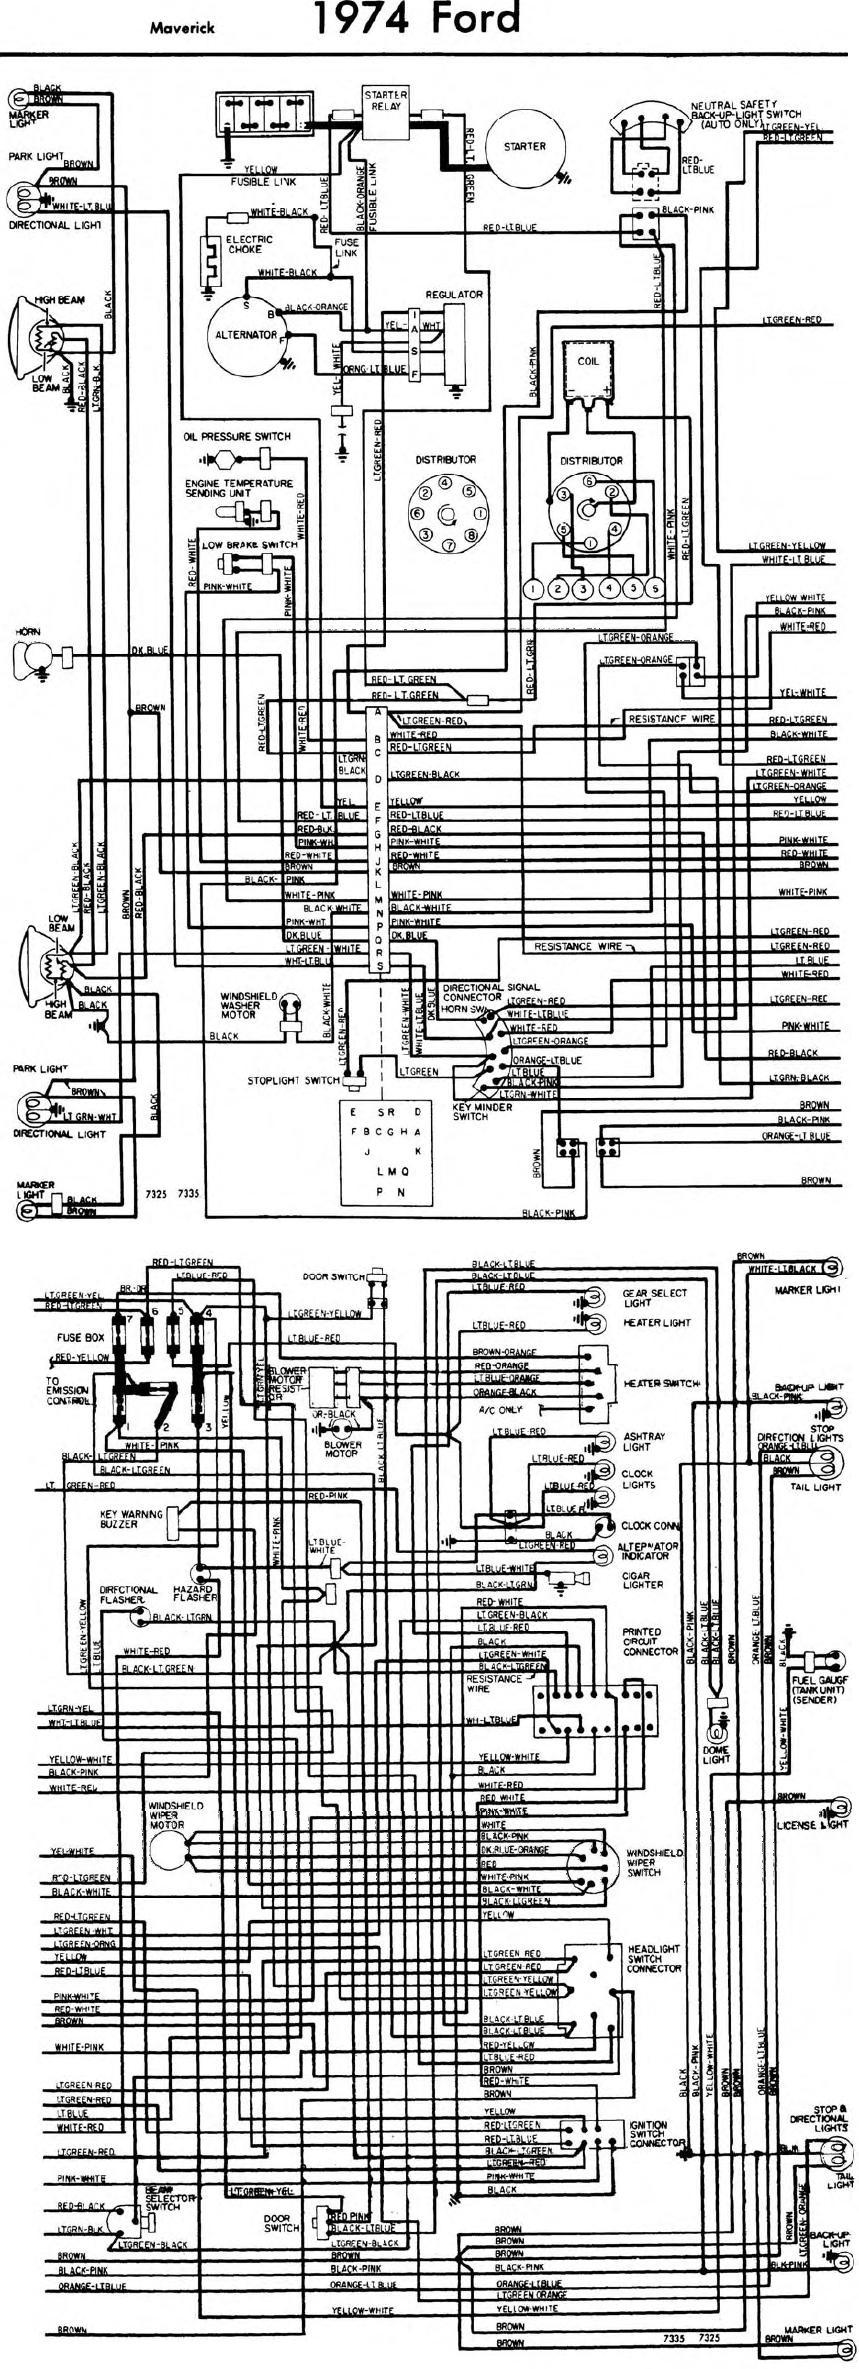 1970 ford maverick wiring diagram wiring schematic data 95 ford starter solenoid wiring diagram 1970 ford [ 859 x 2369 Pixel ]